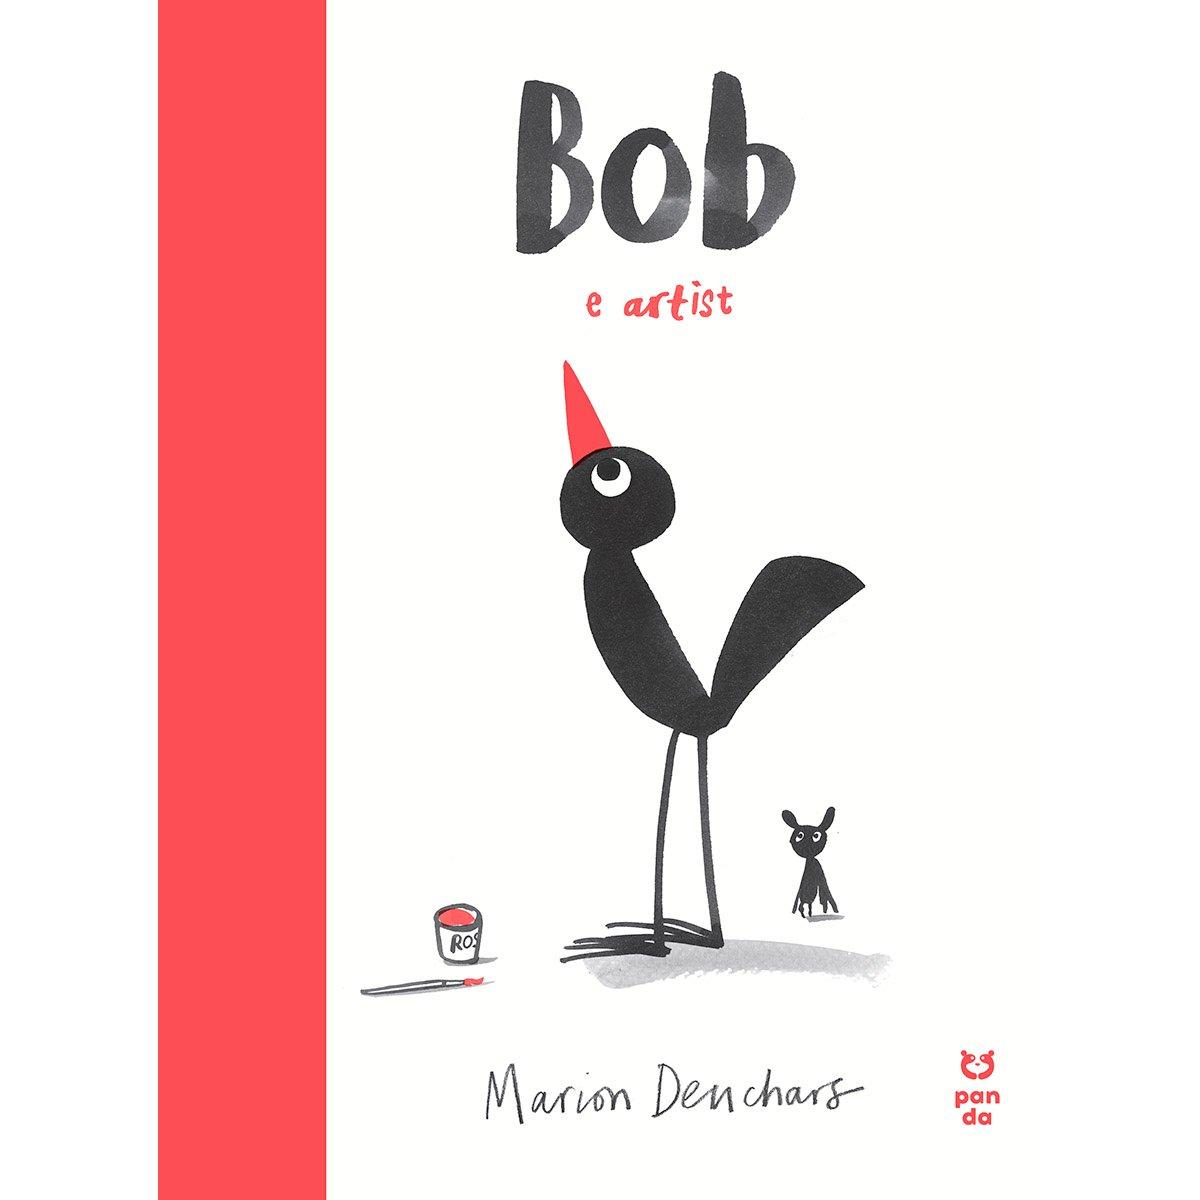 Carte Editura Pandora M, Bob e artist, Marion Deuchars